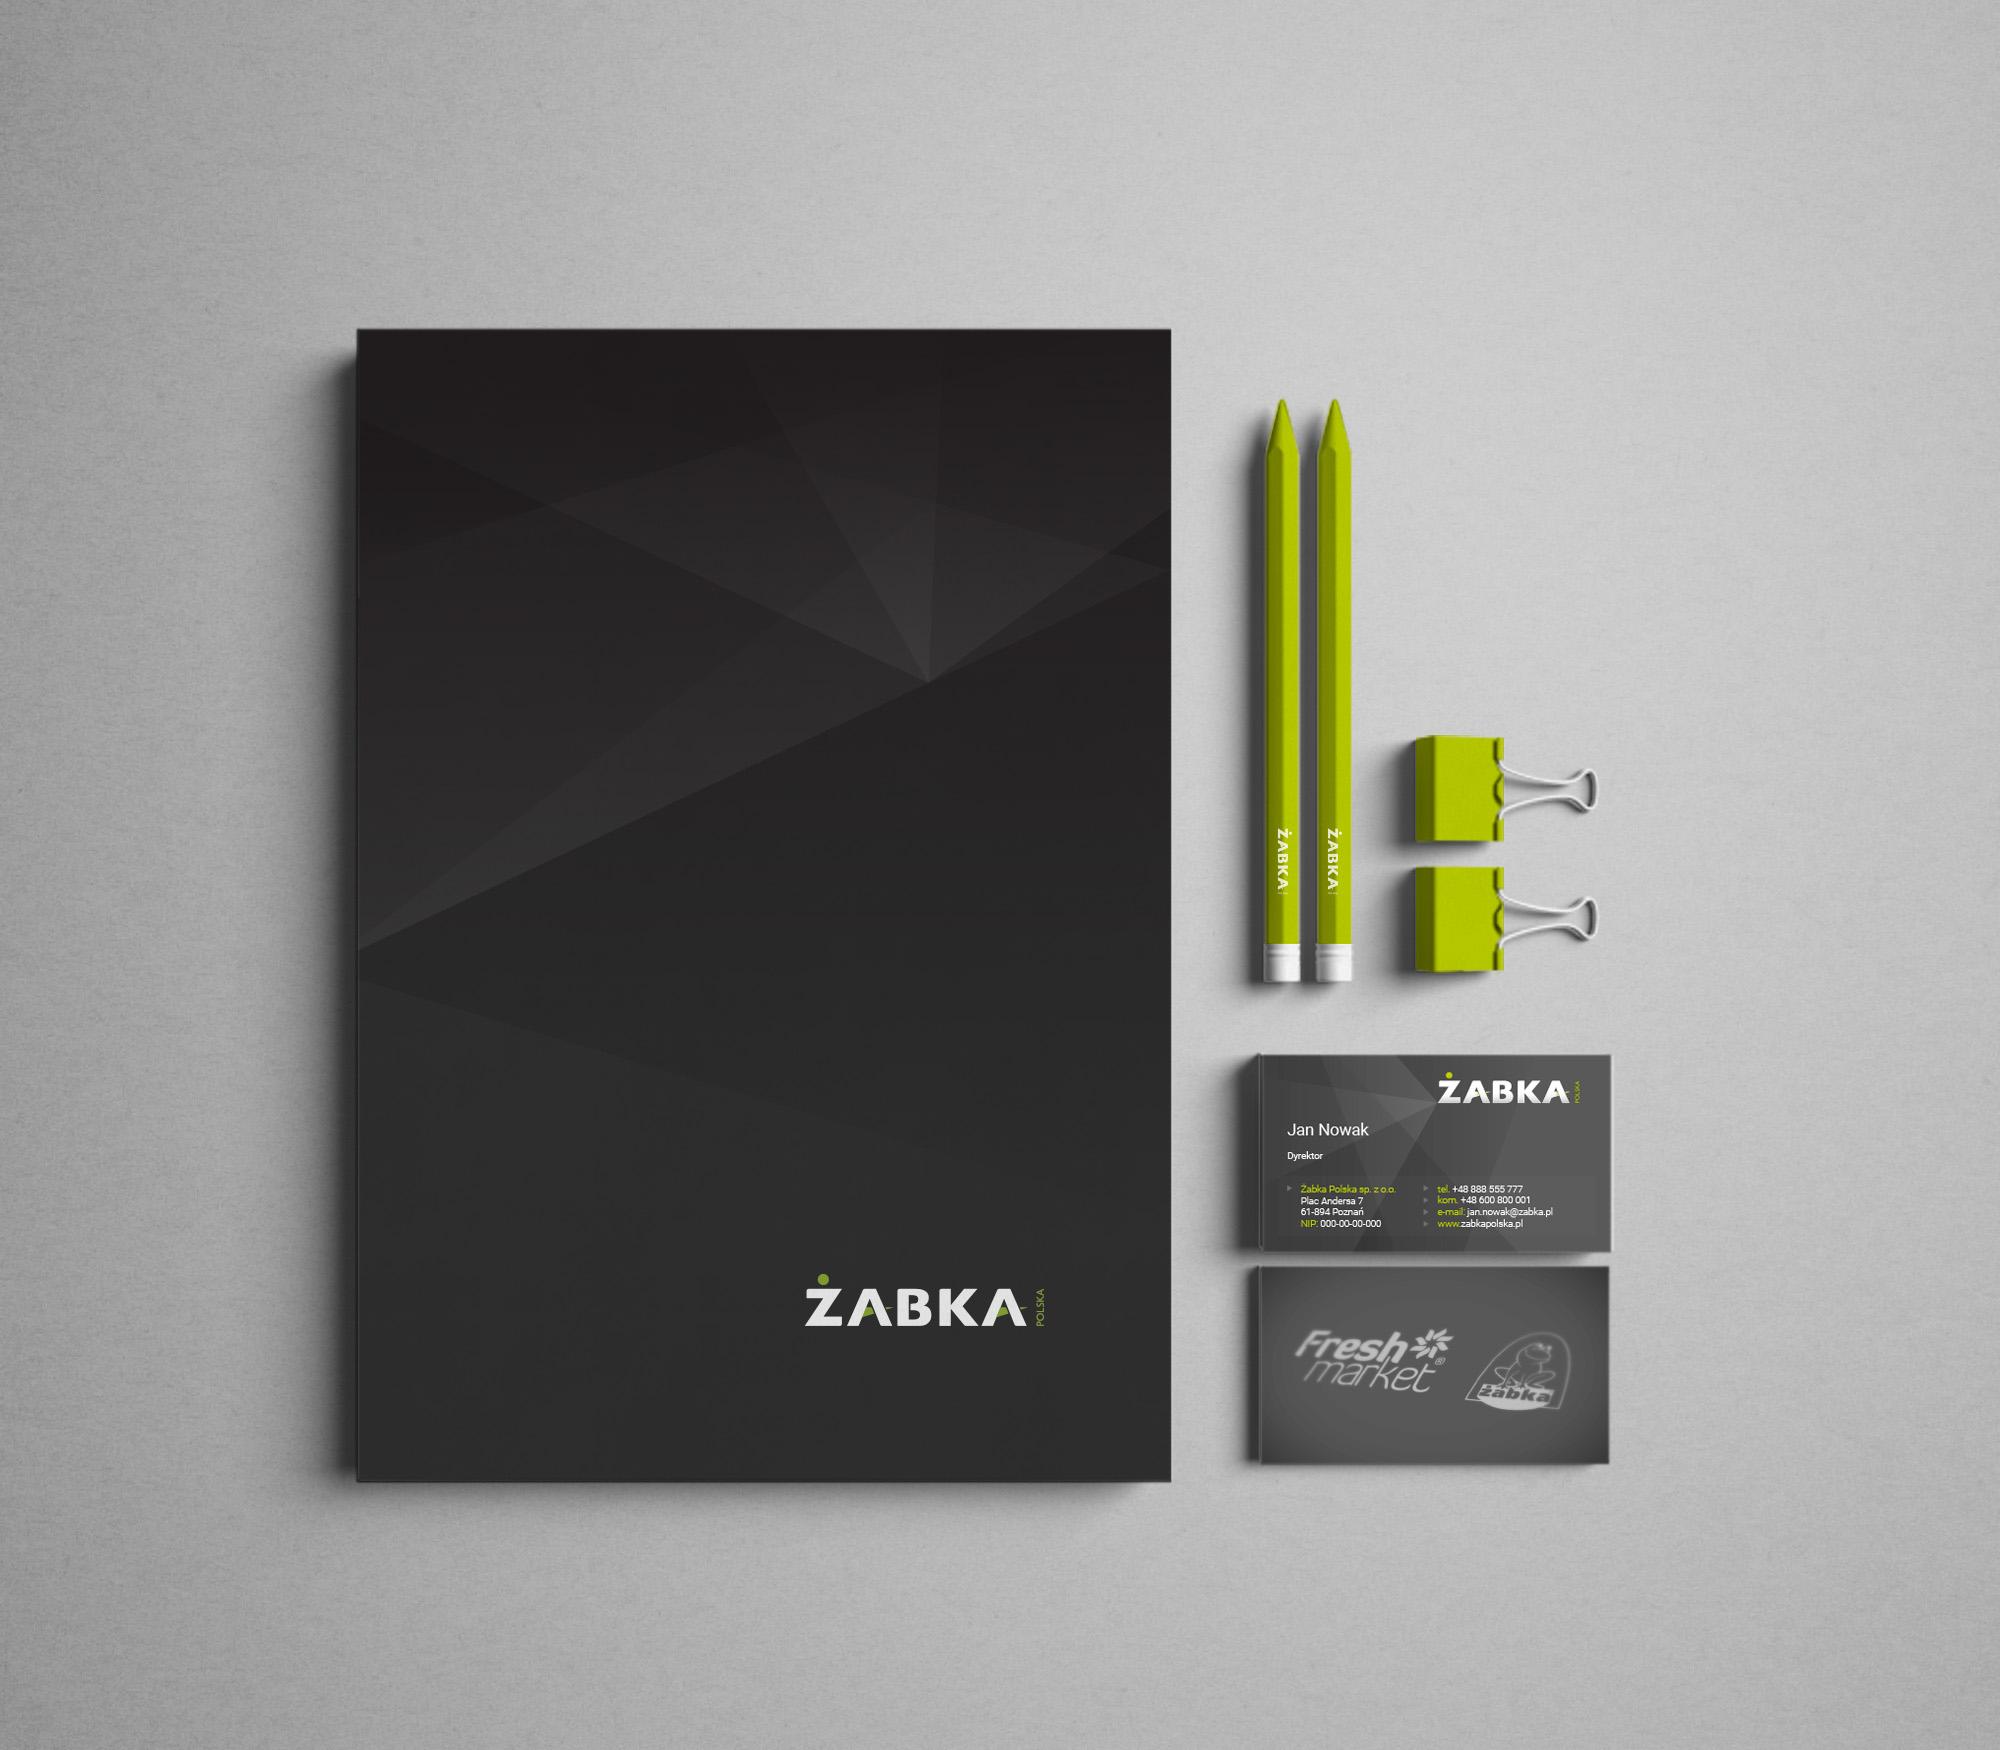 logo design, identyfikacja marki, branding, brand book, znak graficzny, Żabka Polska, logo firmy, ci, art designer - Ireneusz Bloch